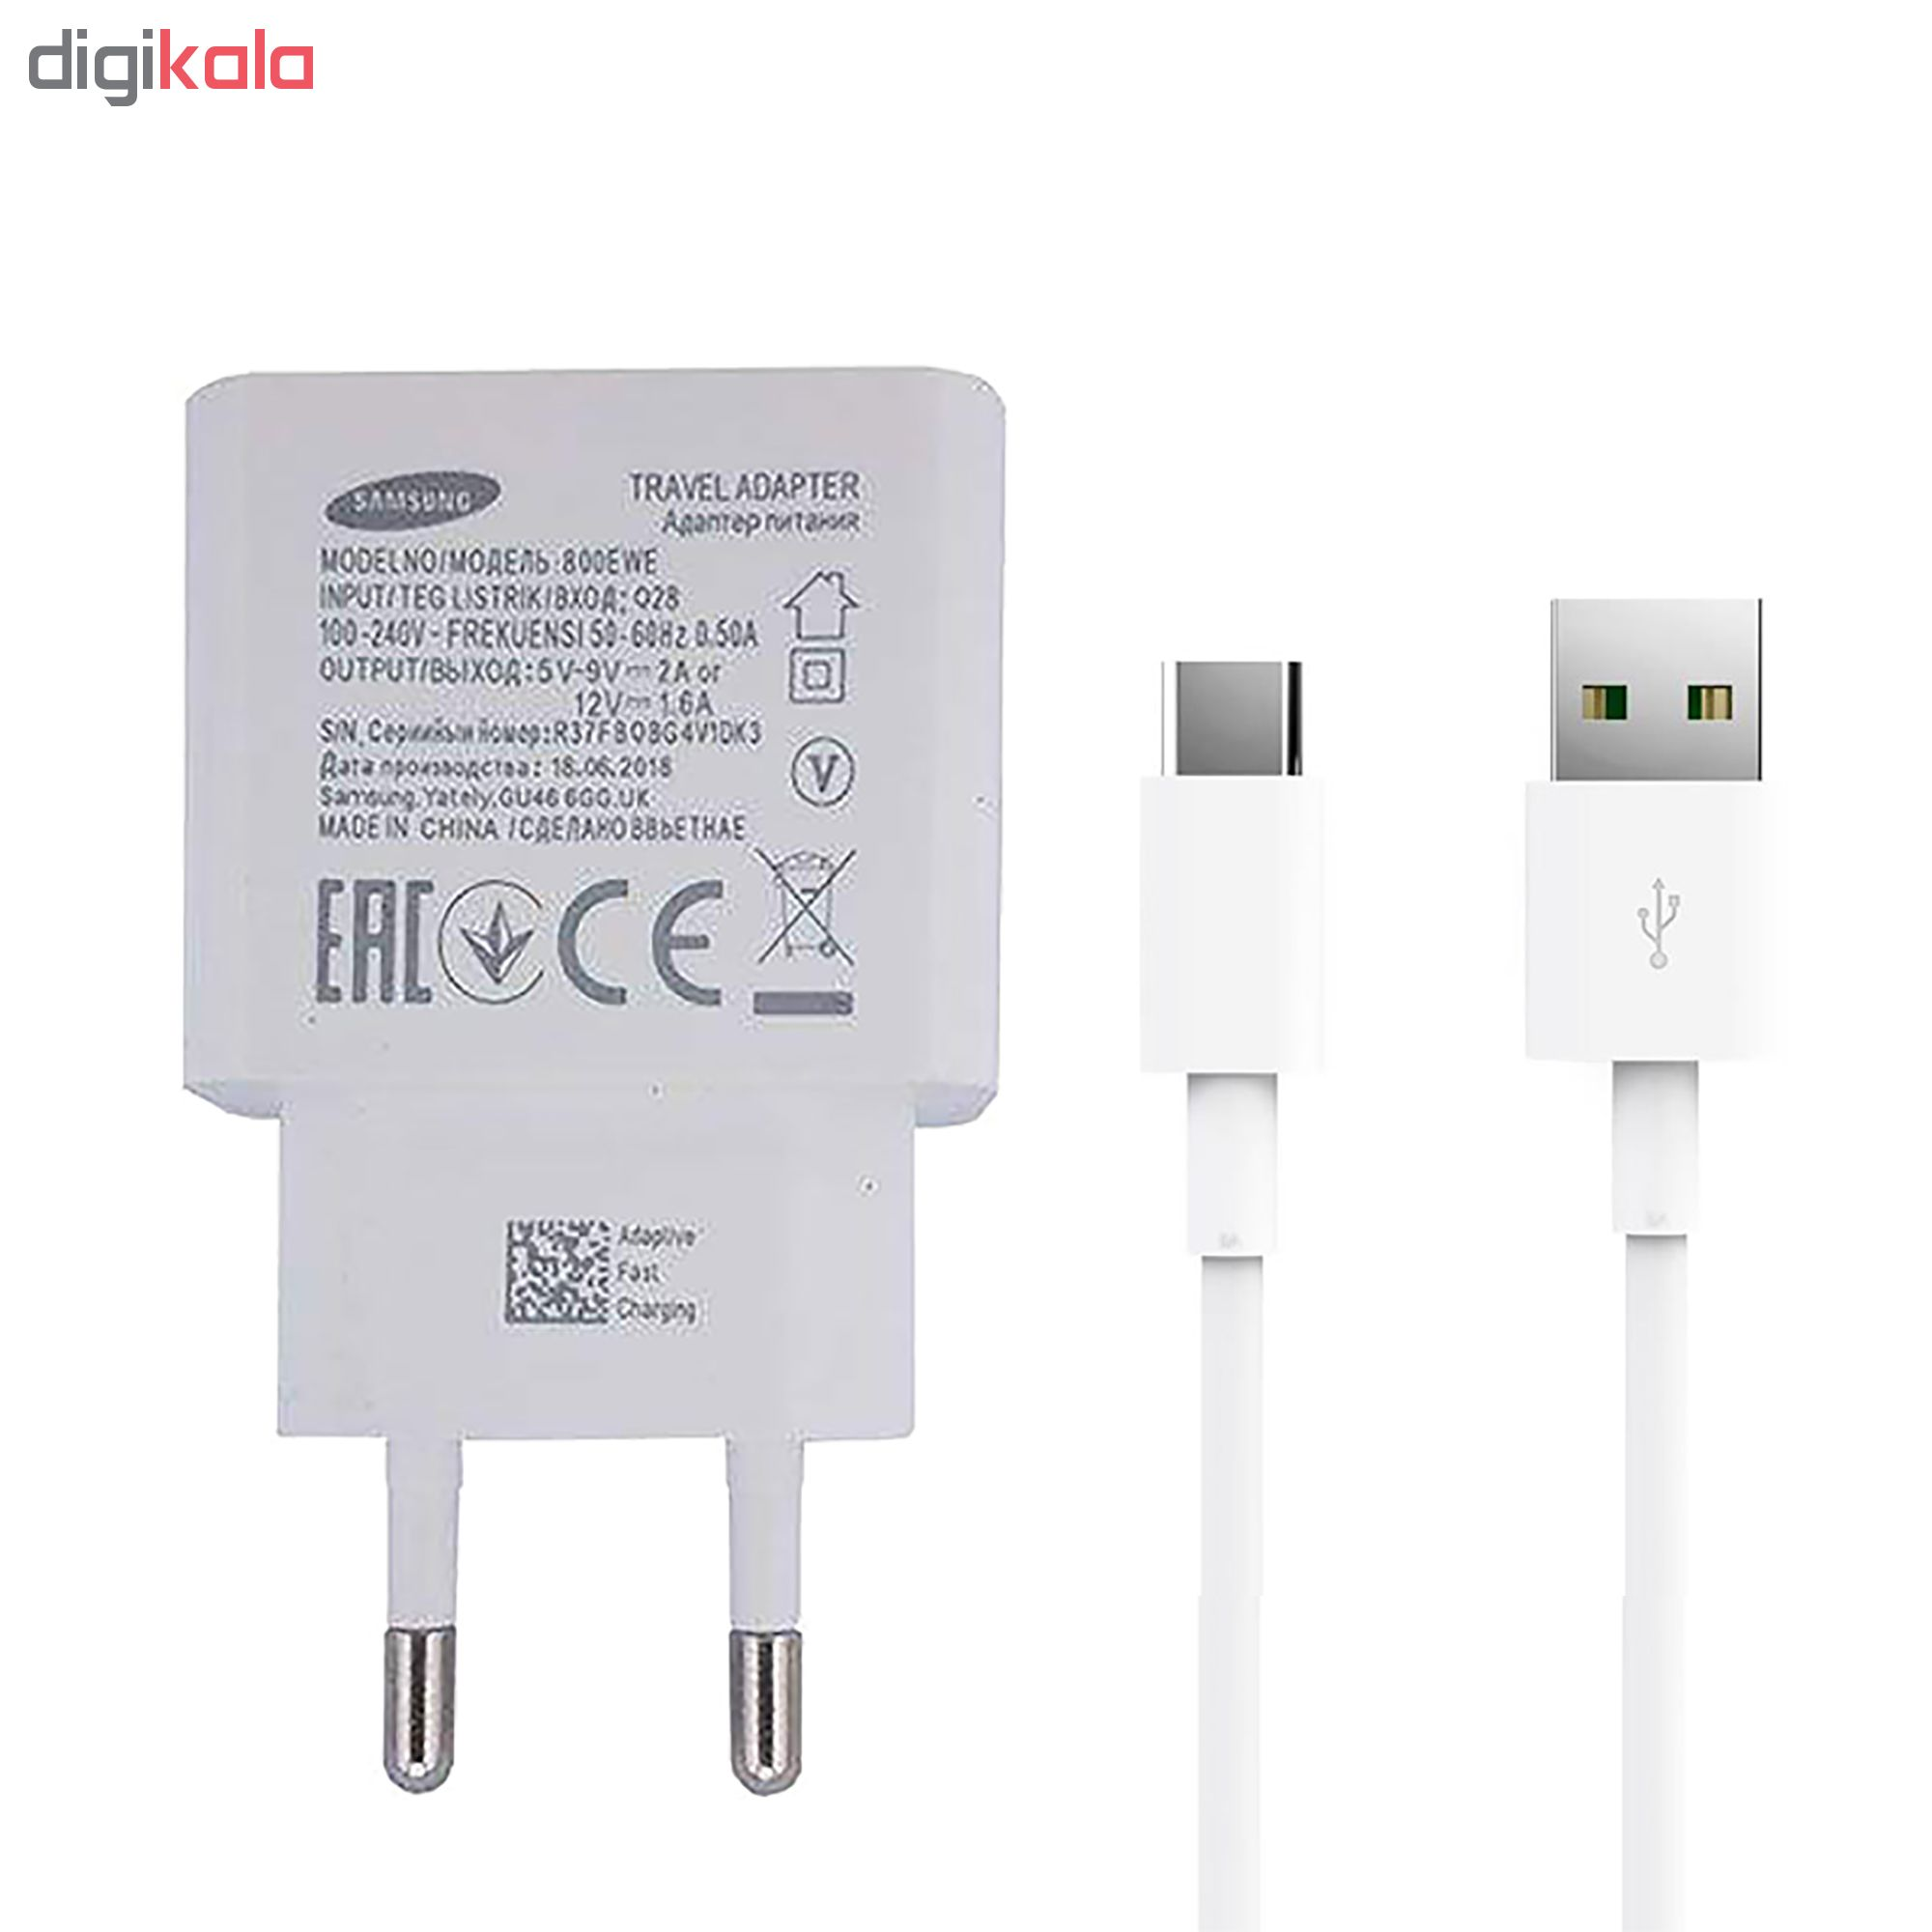 شارژر دیواری مدل 800EWE به همراه کابل تبدیل USB-C                     غیر اصل